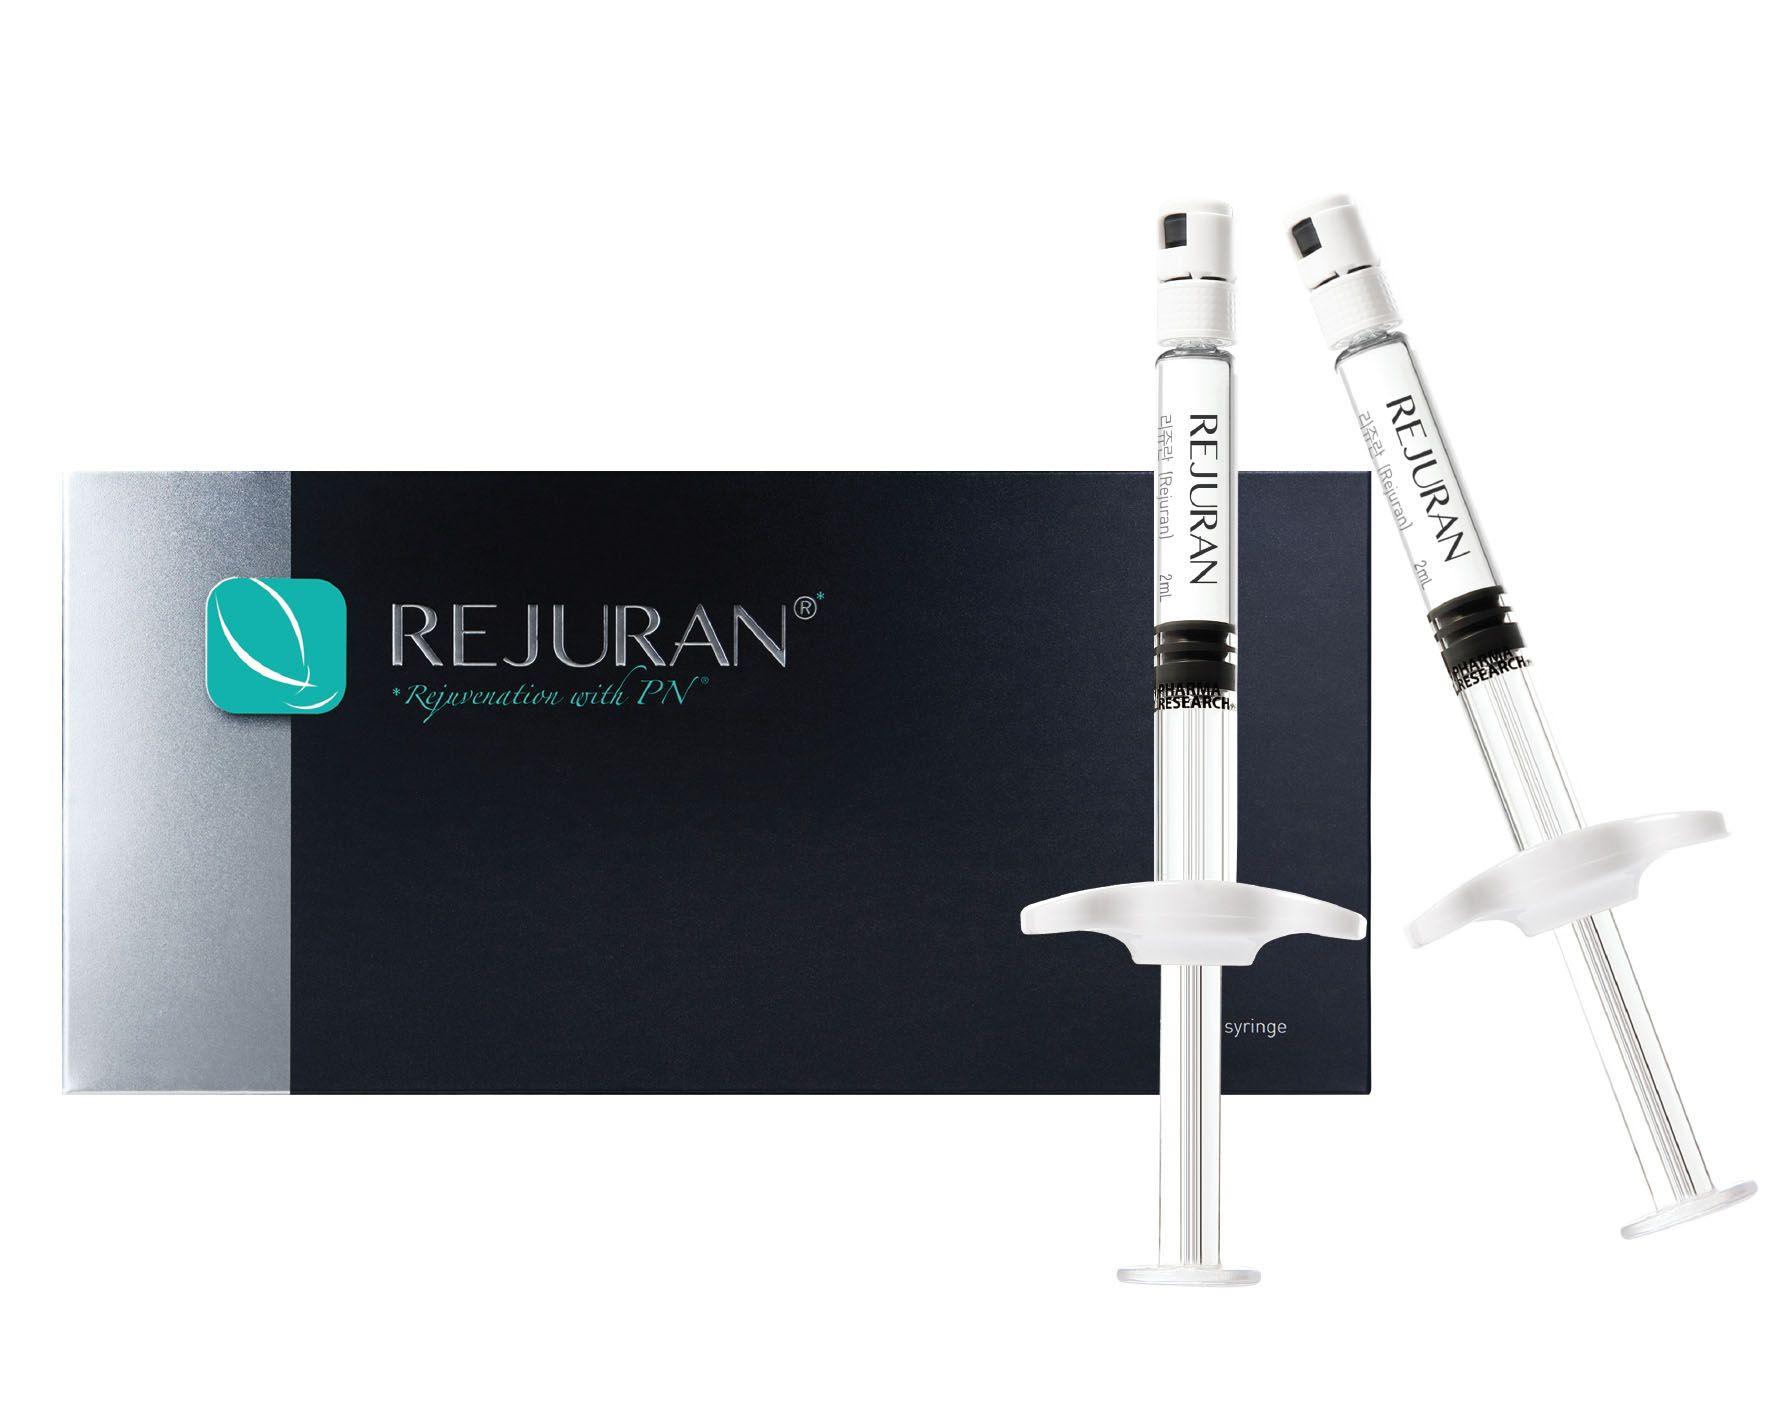 Rejuran Healer products